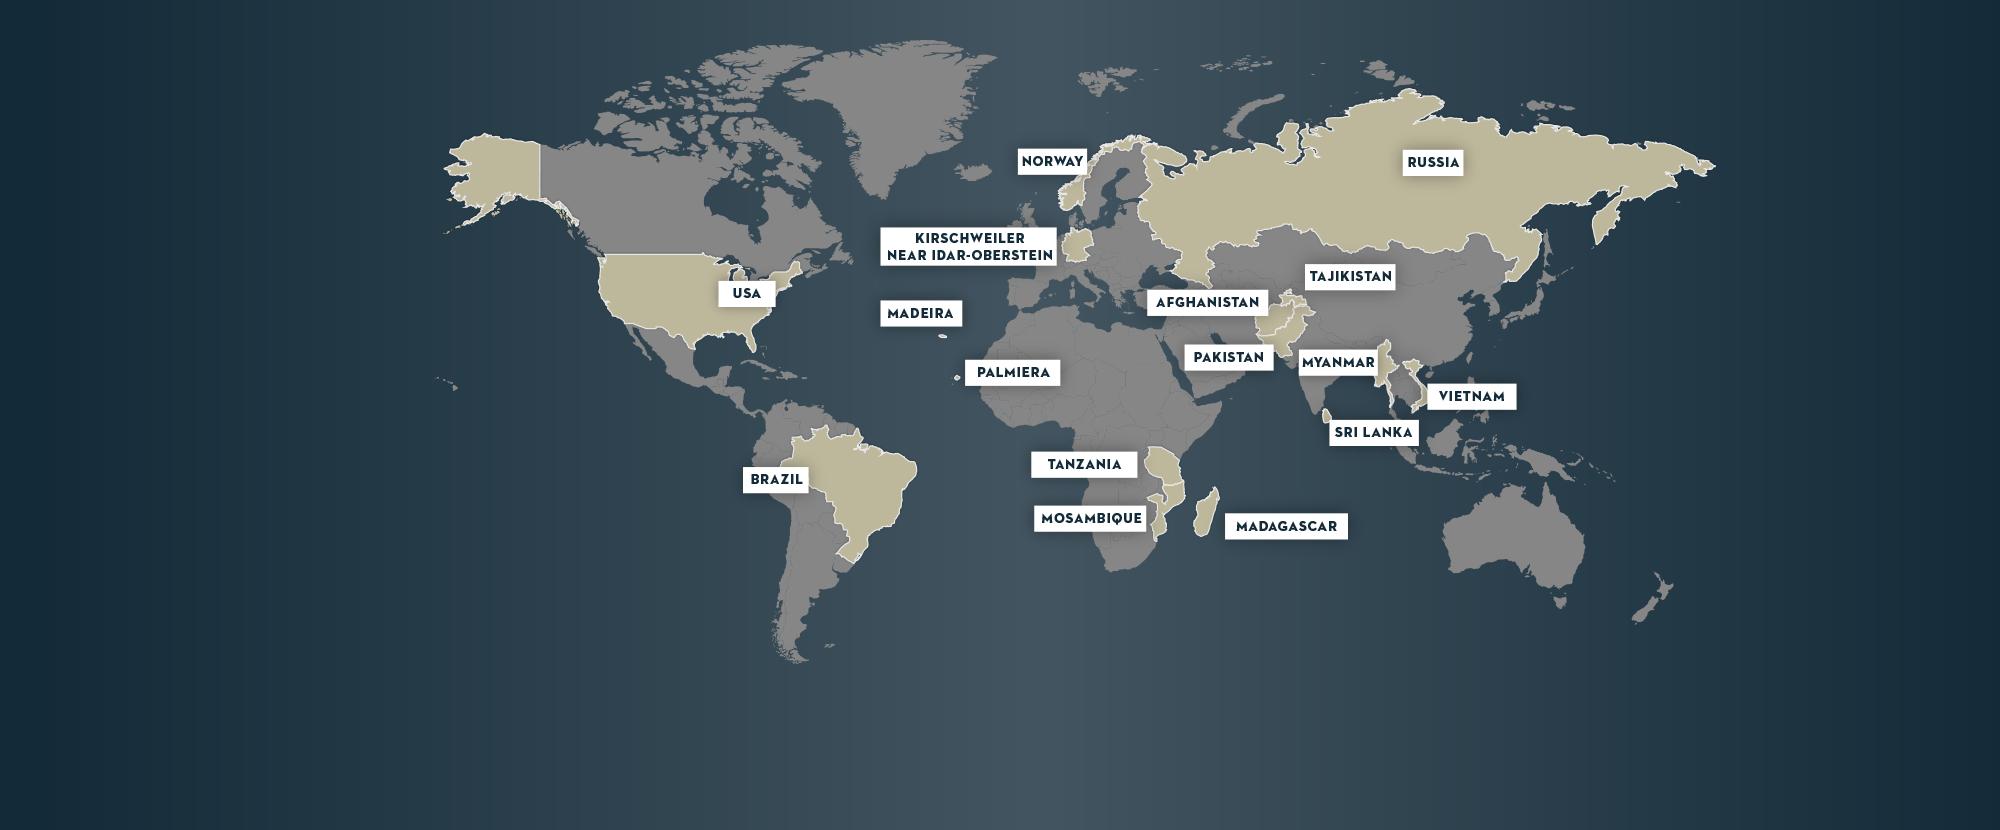 World map with visited places: USA, Brazil, Madeira, Palmeira,Kirschweiler near Idar-Oberstein, Norway, Tanzania, Mozambique, Madagascar, Afghanistan, Pakistan, Tajikistan, Burma, Sri Lanka, Vietnam, Russia